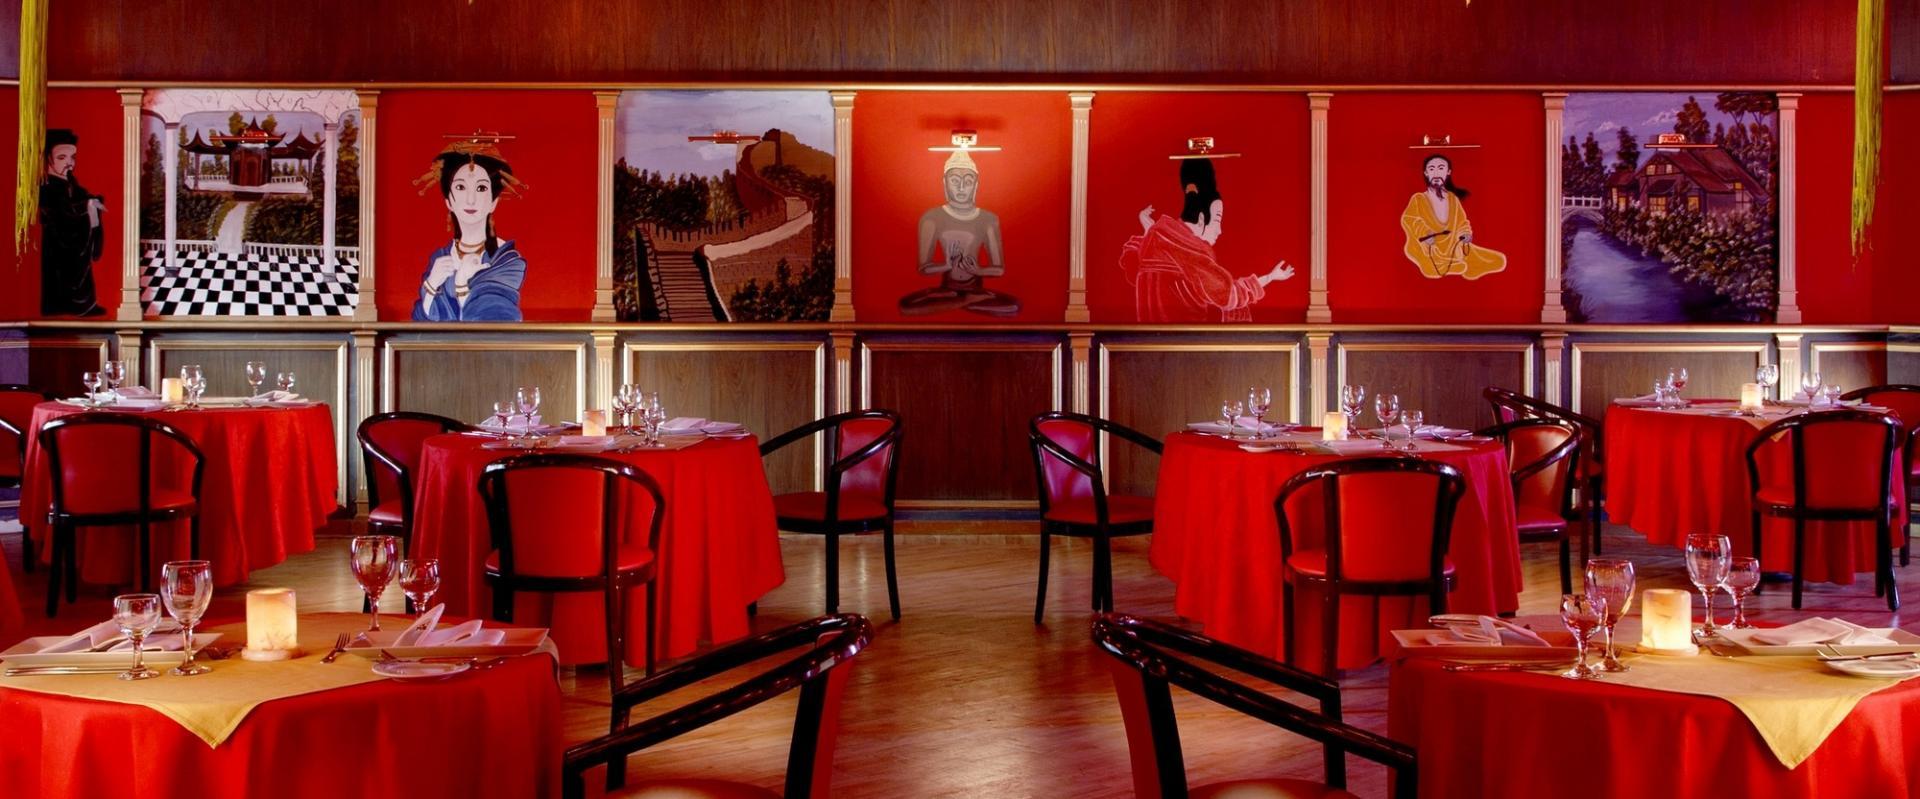 http://egypte.croisiere.voyage/wp-content/uploads/2016/11/HRG-SH-Hurghada-Asian-Restaurant.jpg